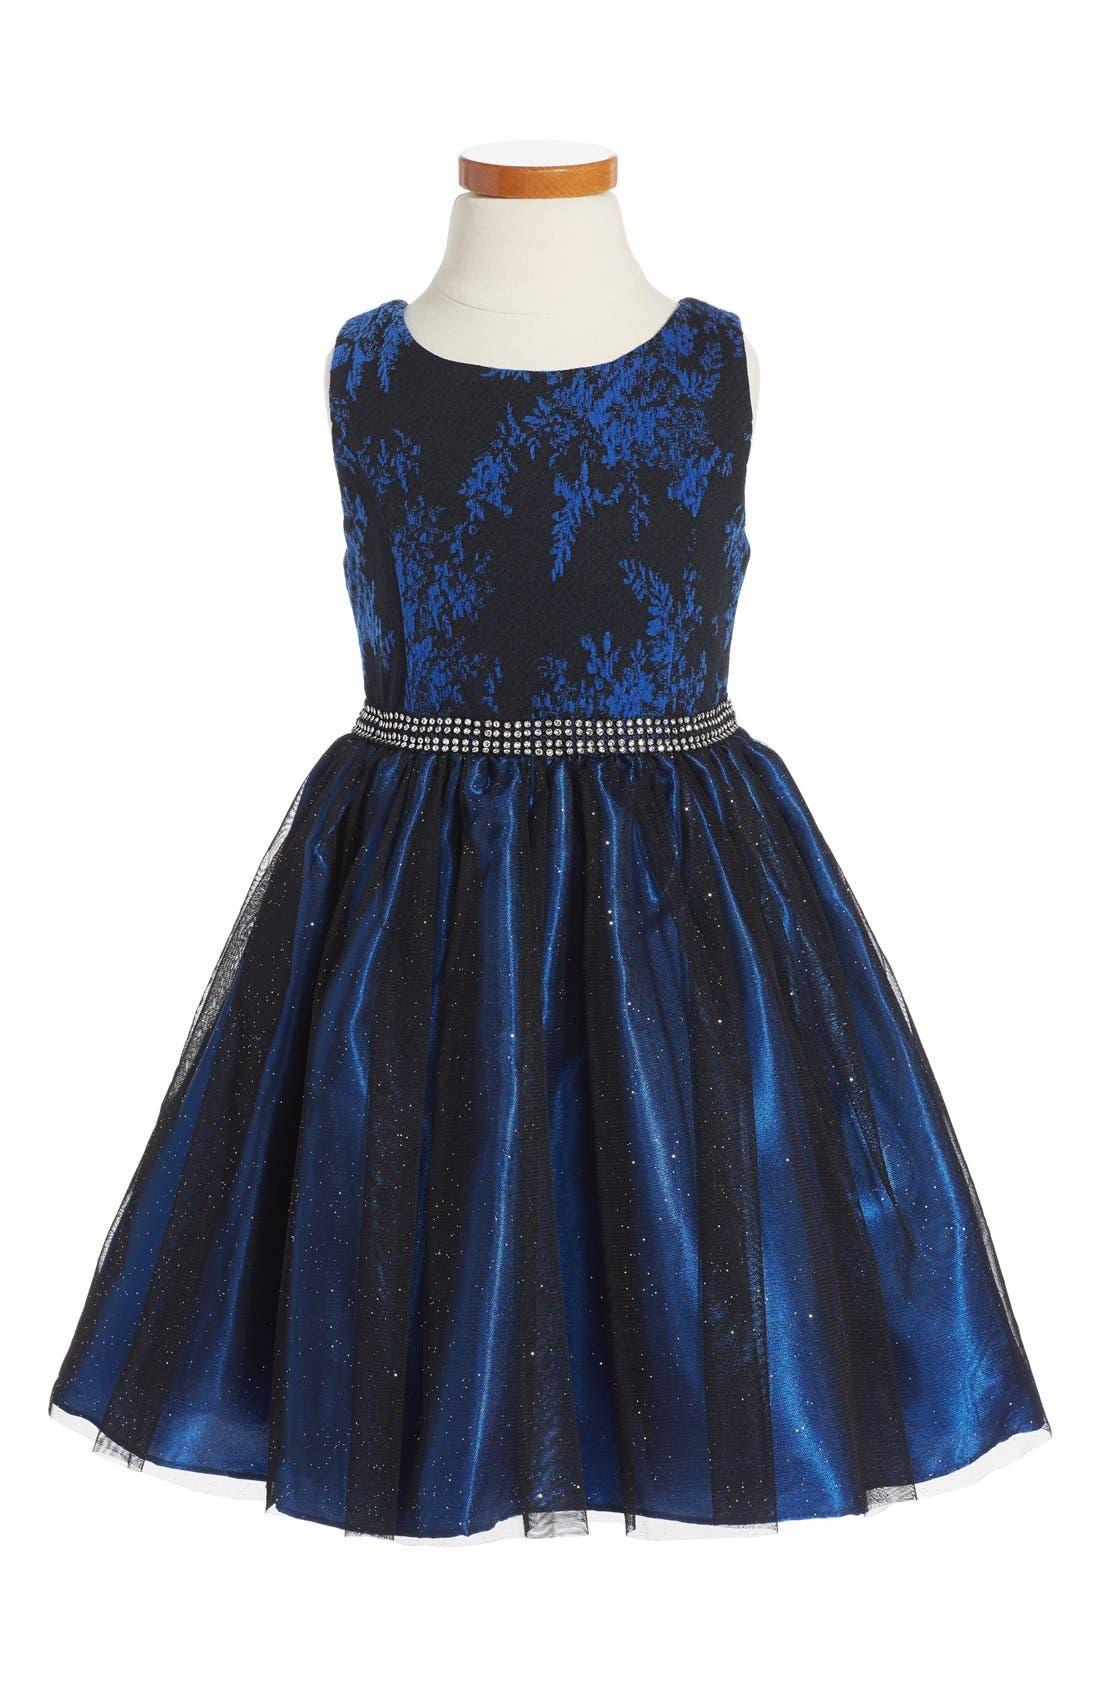 Main Image - Sweet Heart Rose Fit & Flare Dress (Toddler Girls, Little Girls & Big Girls)